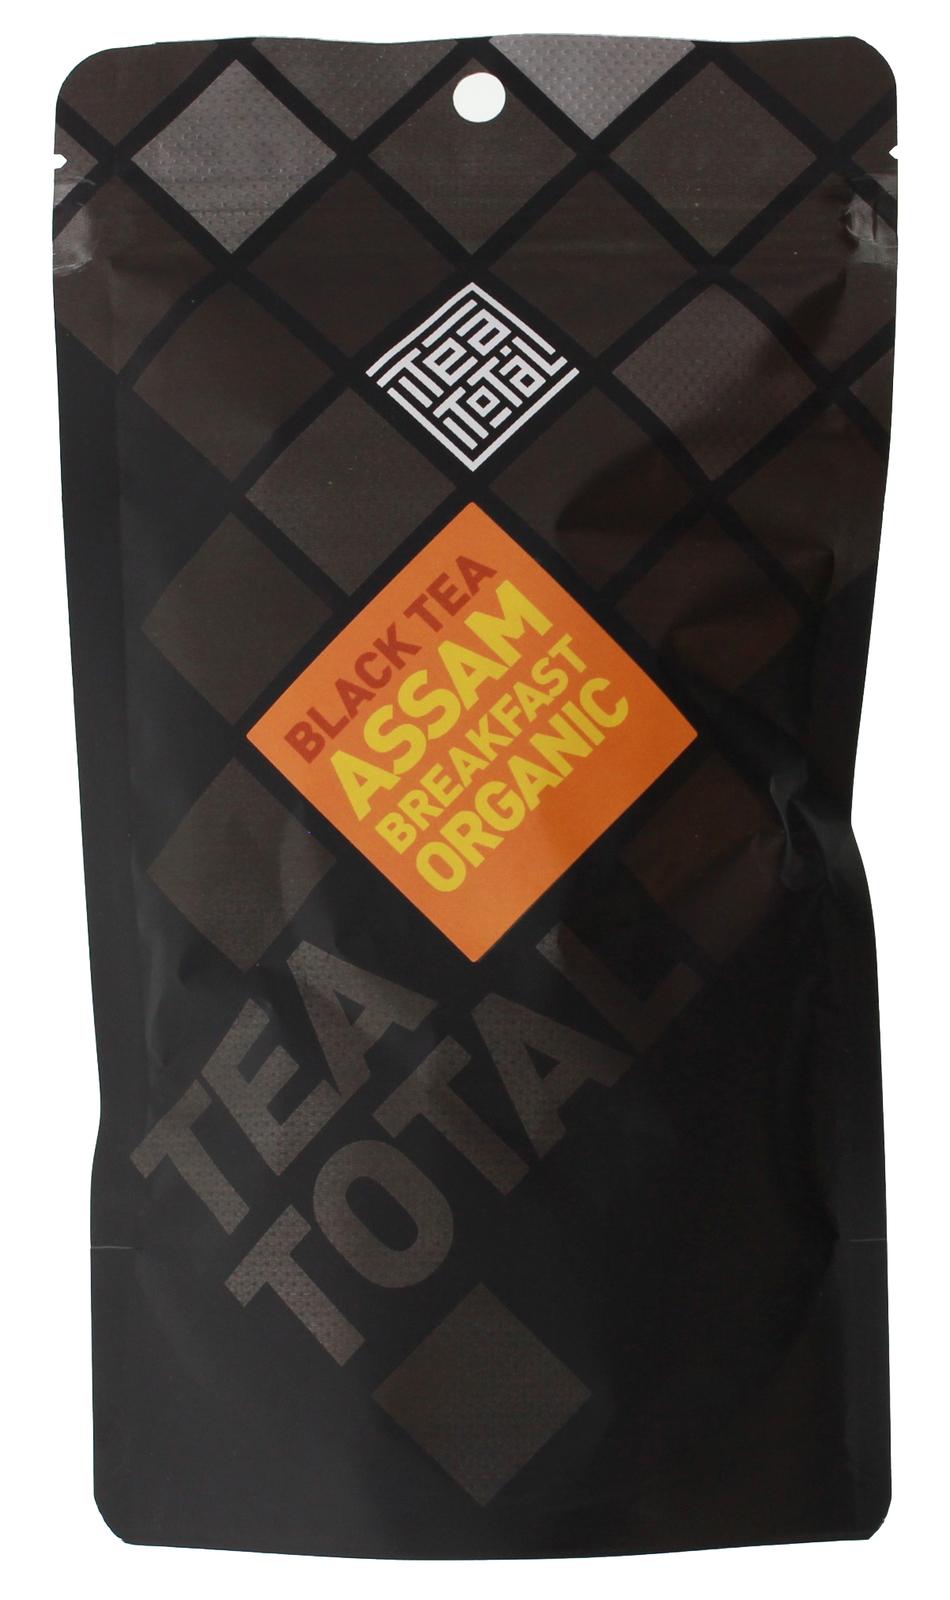 Tea Total - Assam Organic Breakfast Tea (100g Bag) image